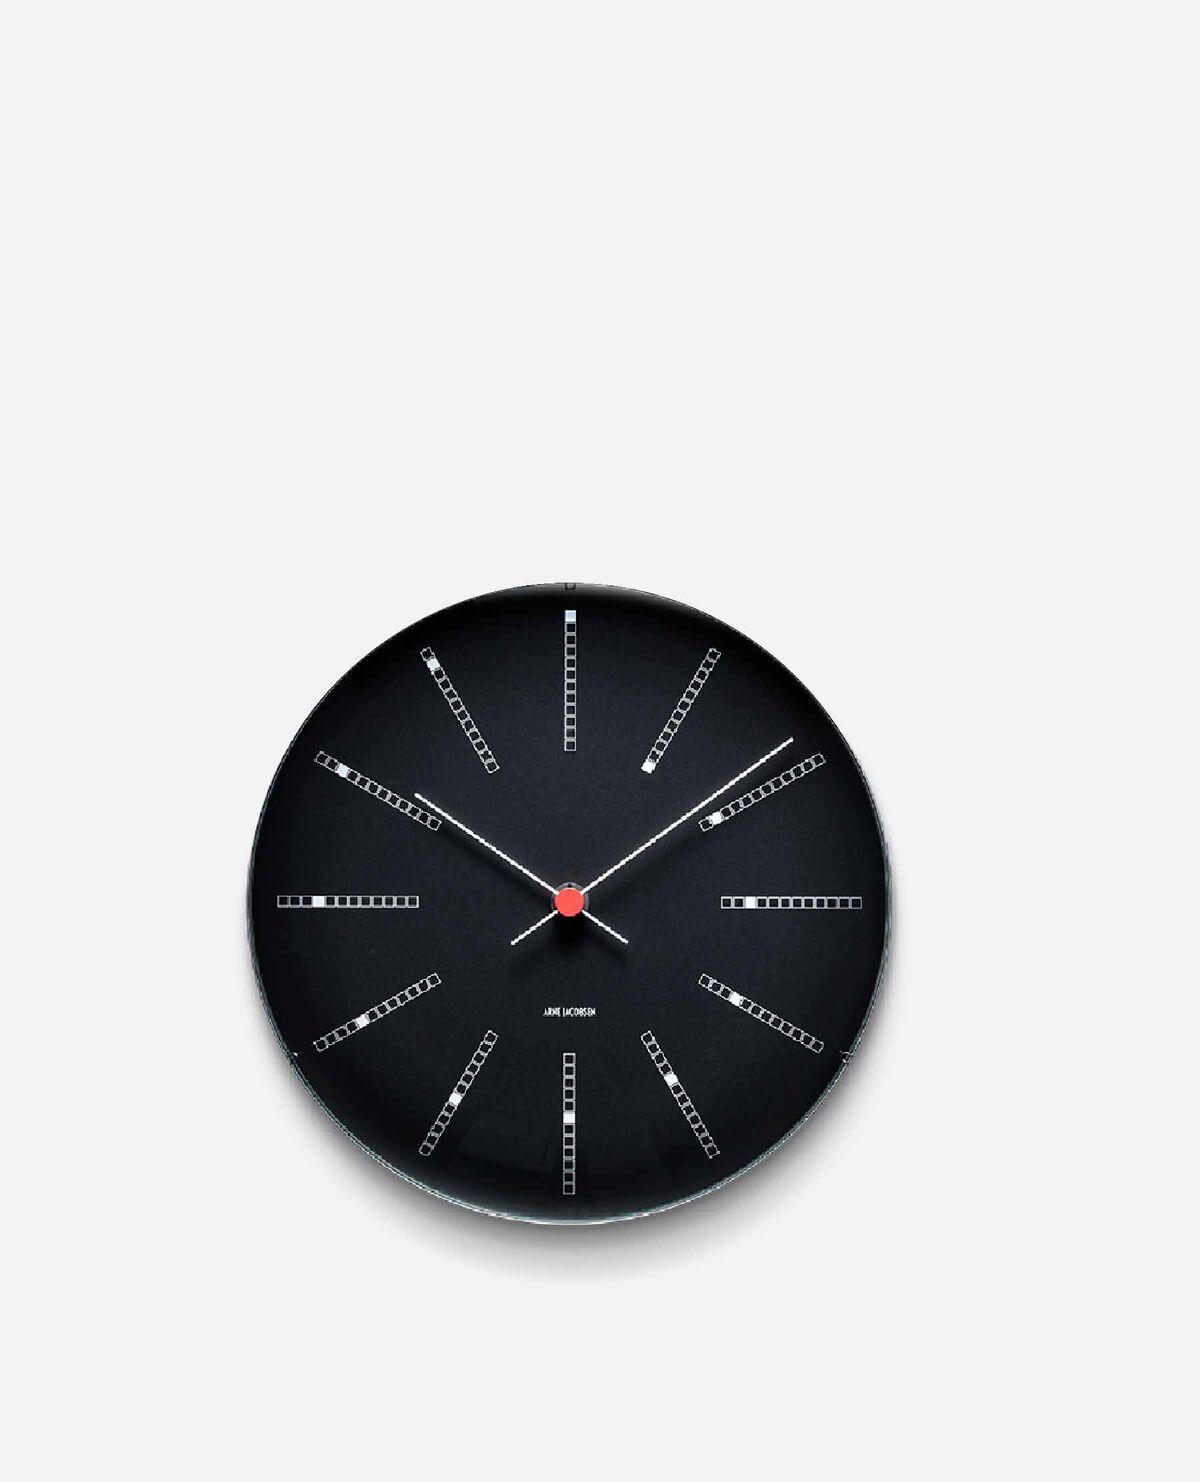 Wall Clock Bankers(ウォールクロック バンカーズ)210mm